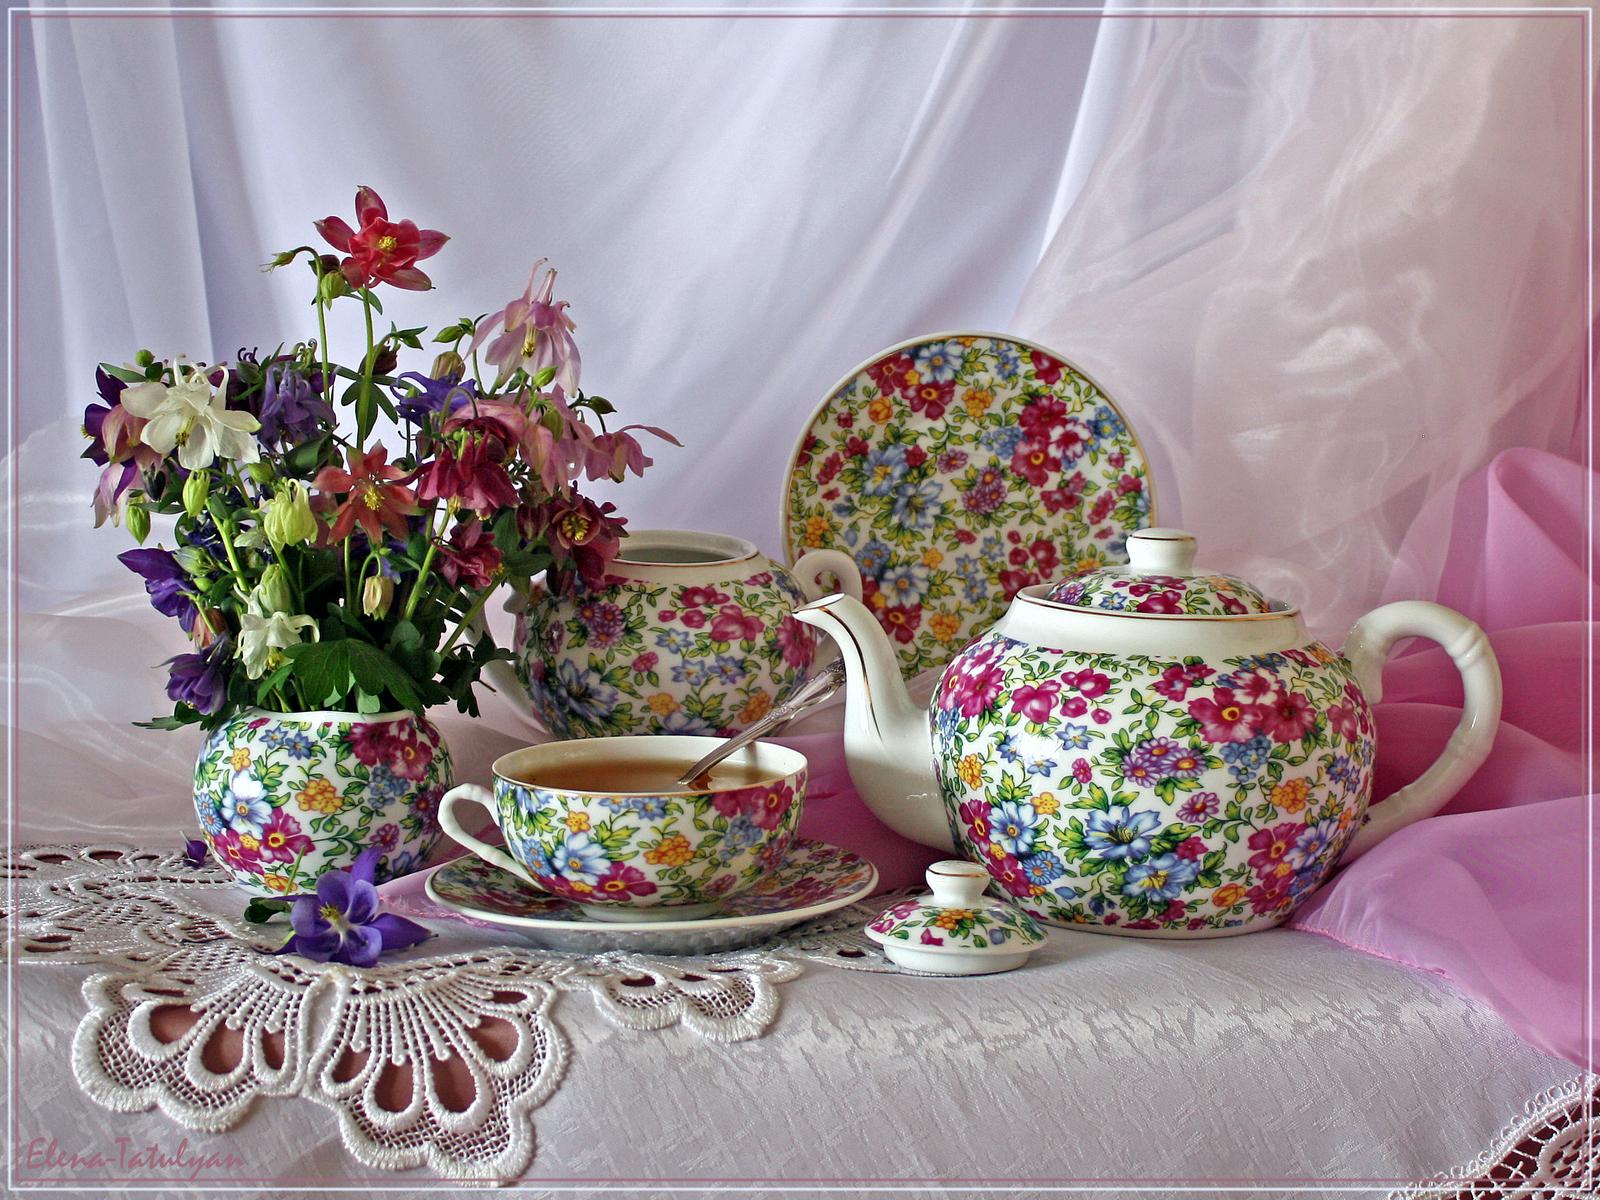 Обои, картинки Напитки : чайный сервис - Еда 239183